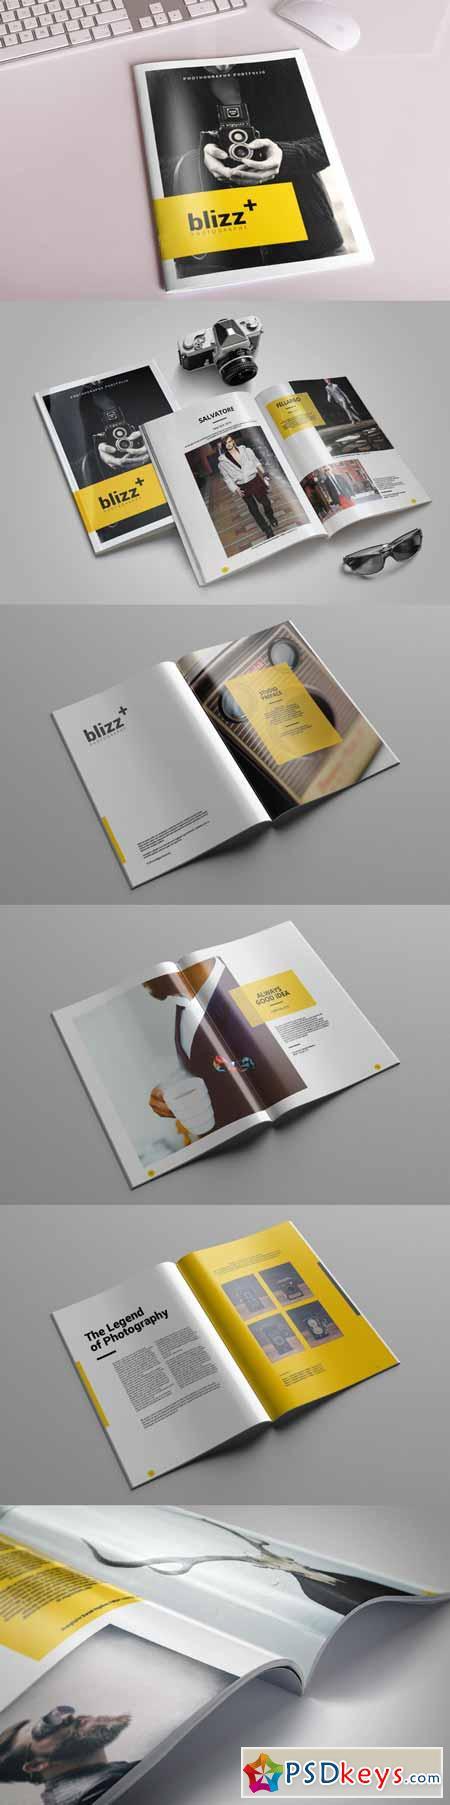 Blizz+ Portfolio 399587